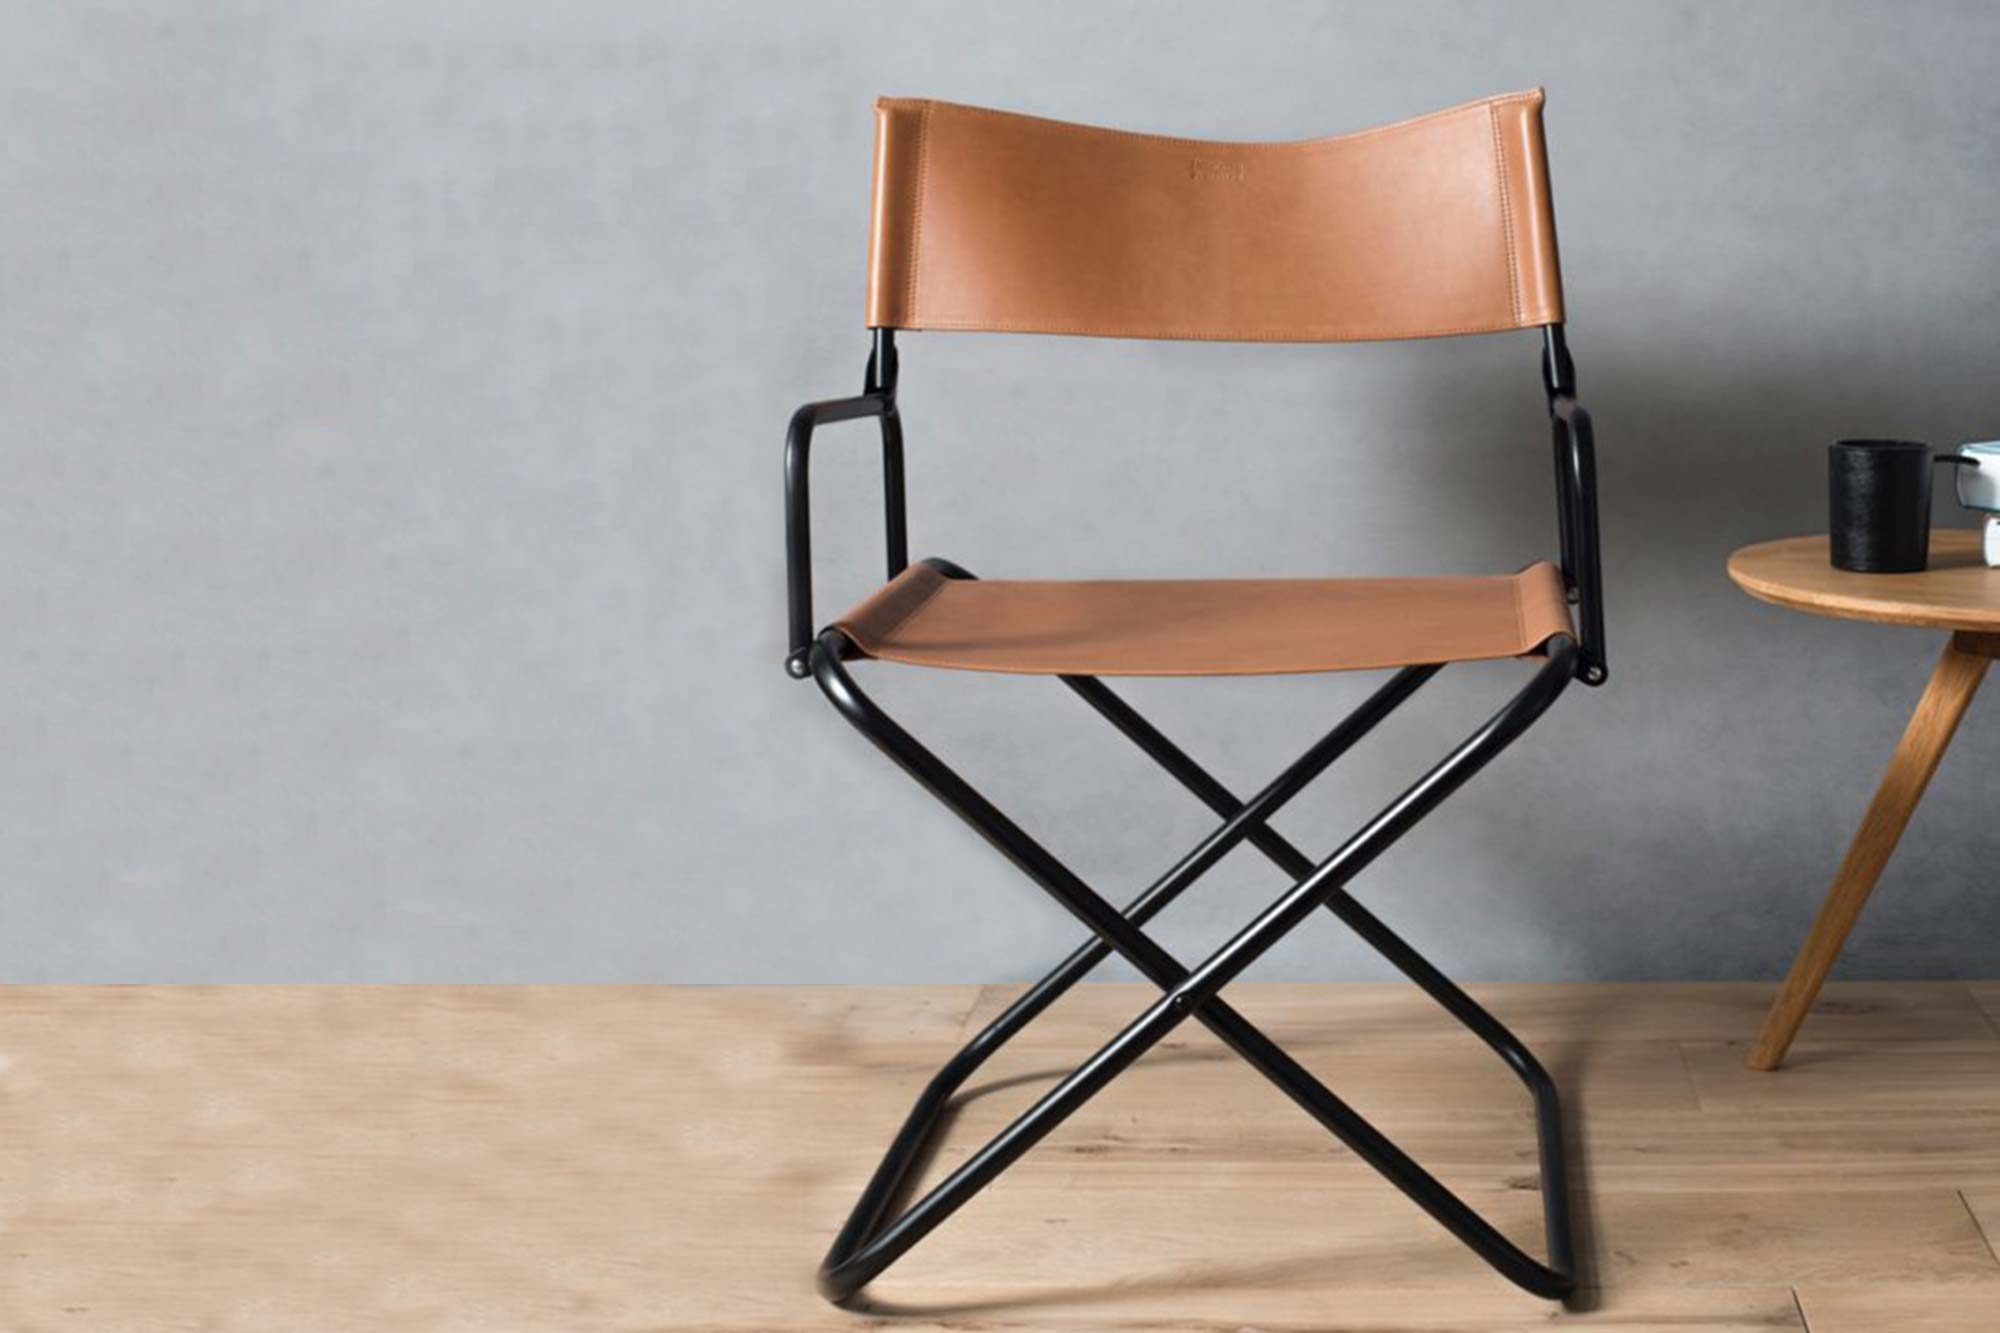 Chaise pliante transformé en cuir tanné végétal